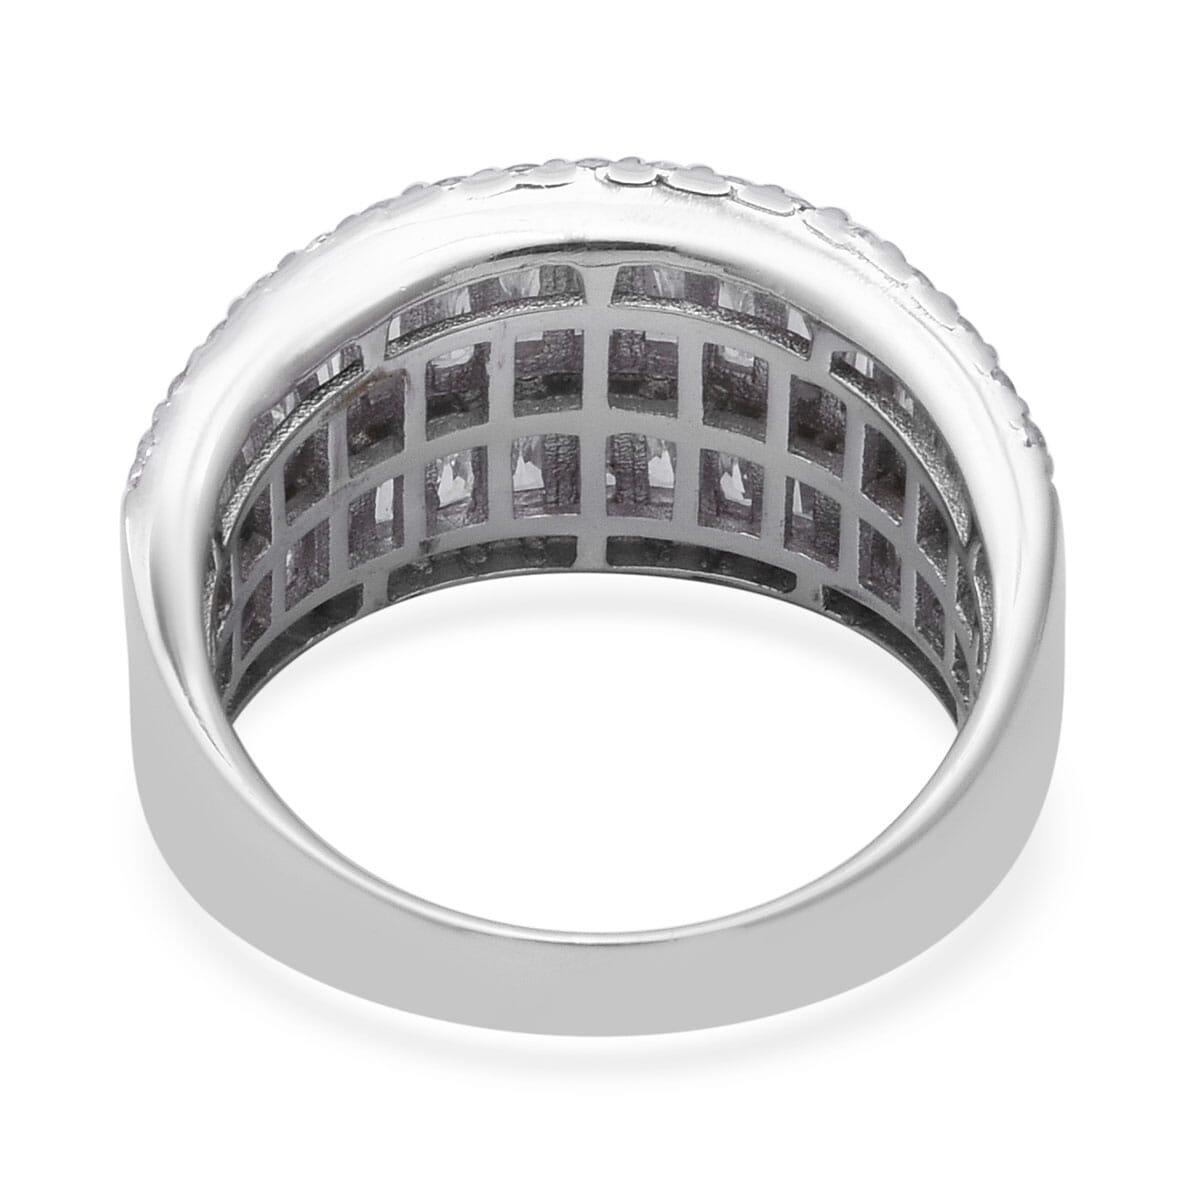 LUSTRO STELLA CZ Ring in Sterling Silver (Size 6.0) (Avg. 7.05 g) 3.73 ctw